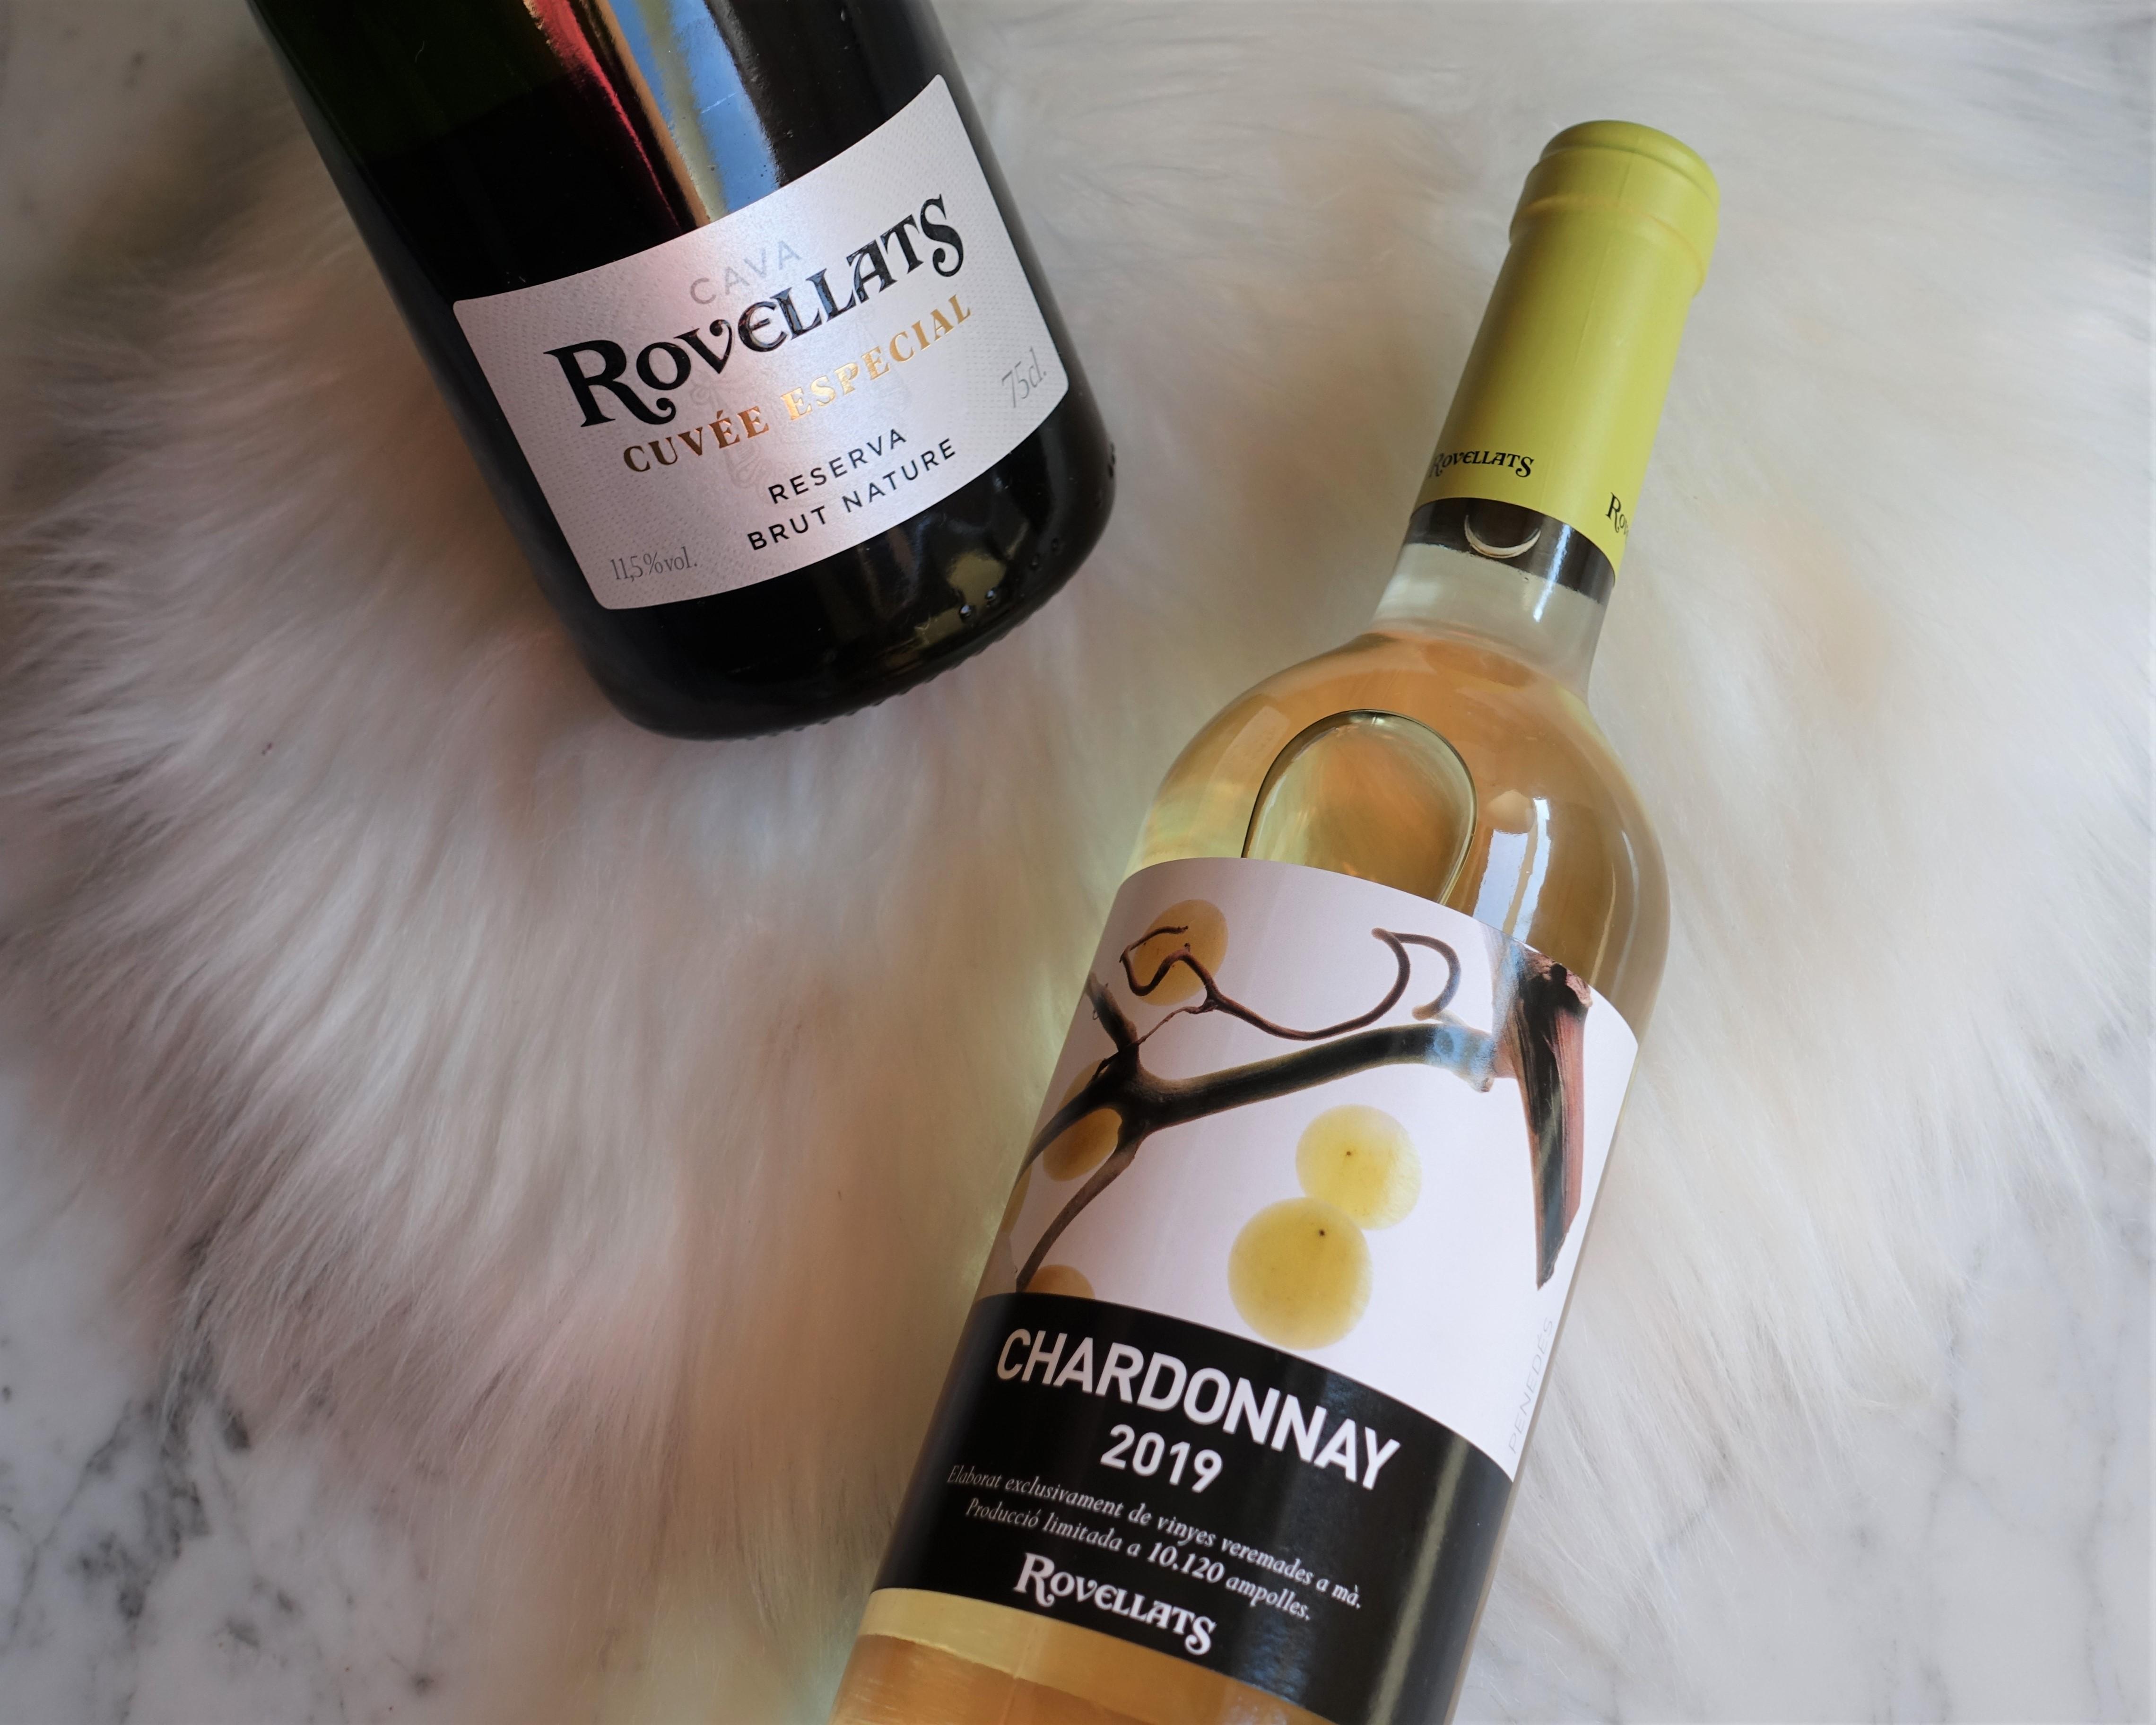 Cava y Chardonnay de Rovellats (Evento #YBB8ED de Girl Power Team)(2)